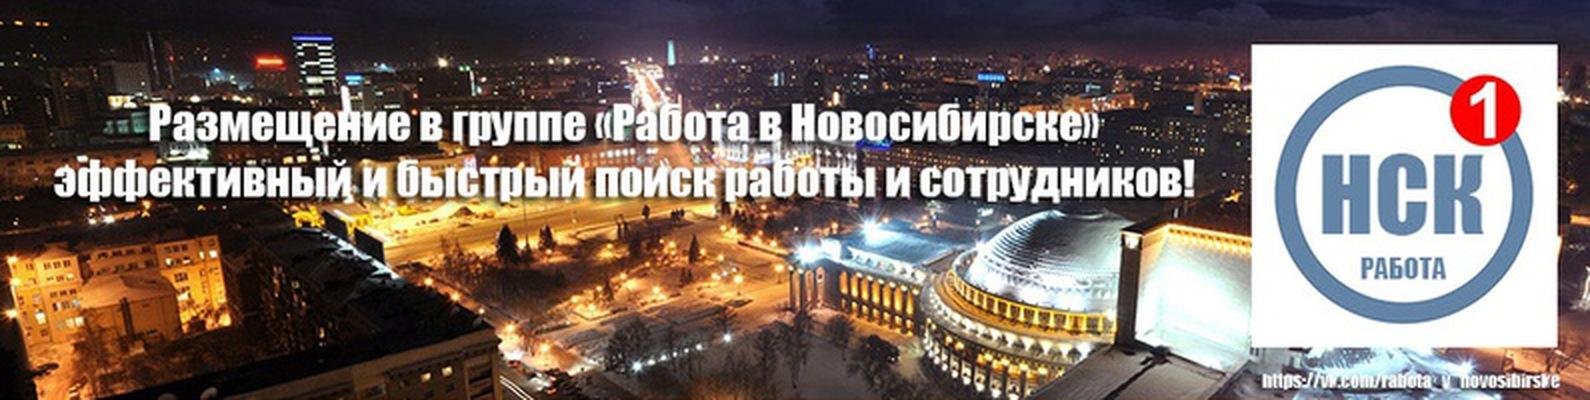 работа по вахте продавец-кассир в москве